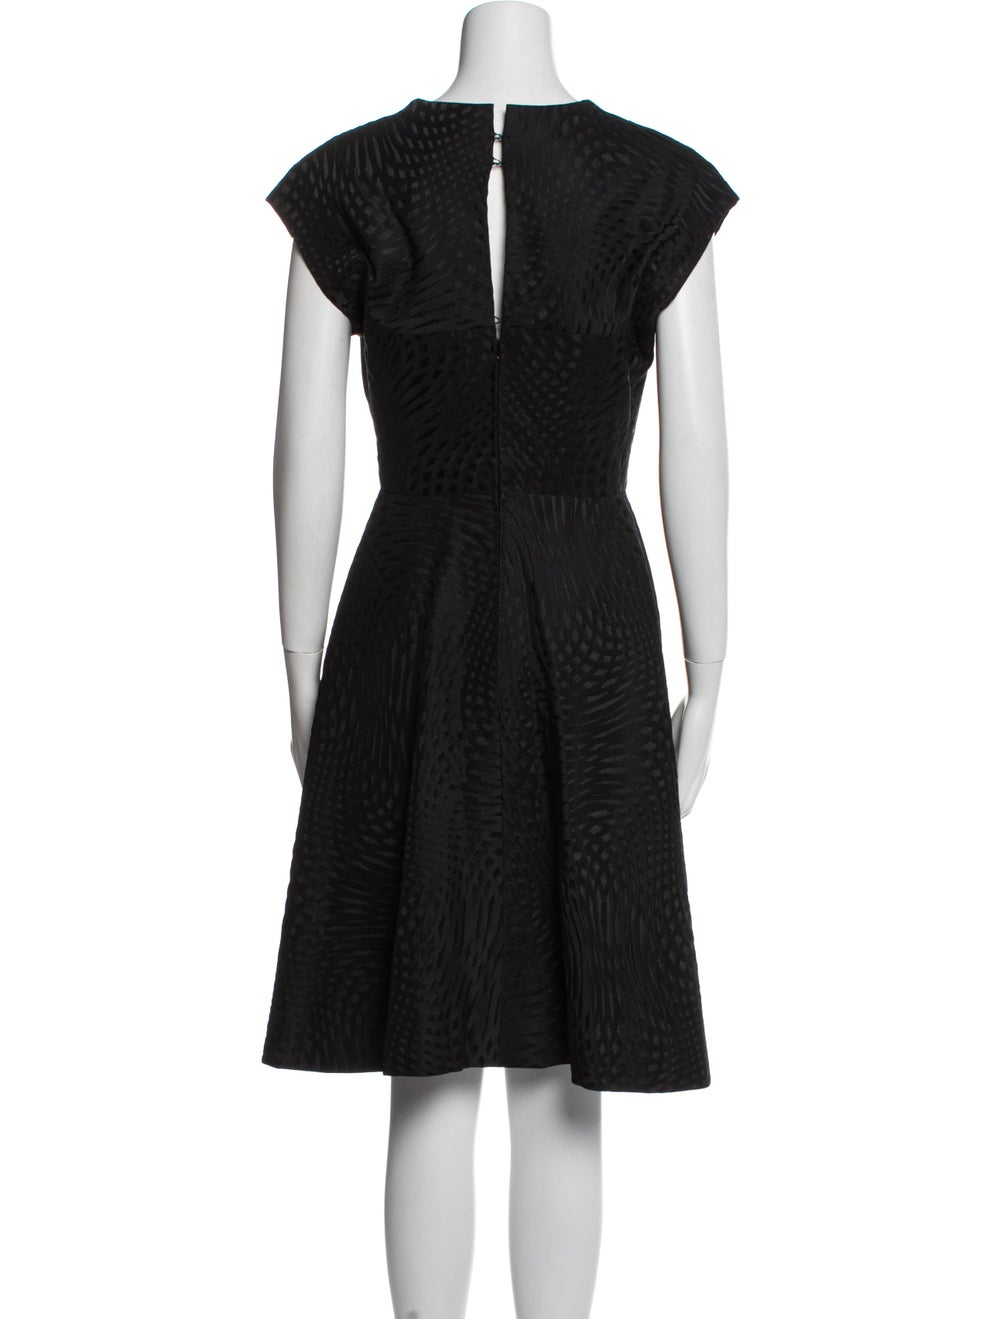 Pauline Trigere V-Neck Knee-Length Dress Black - image 3